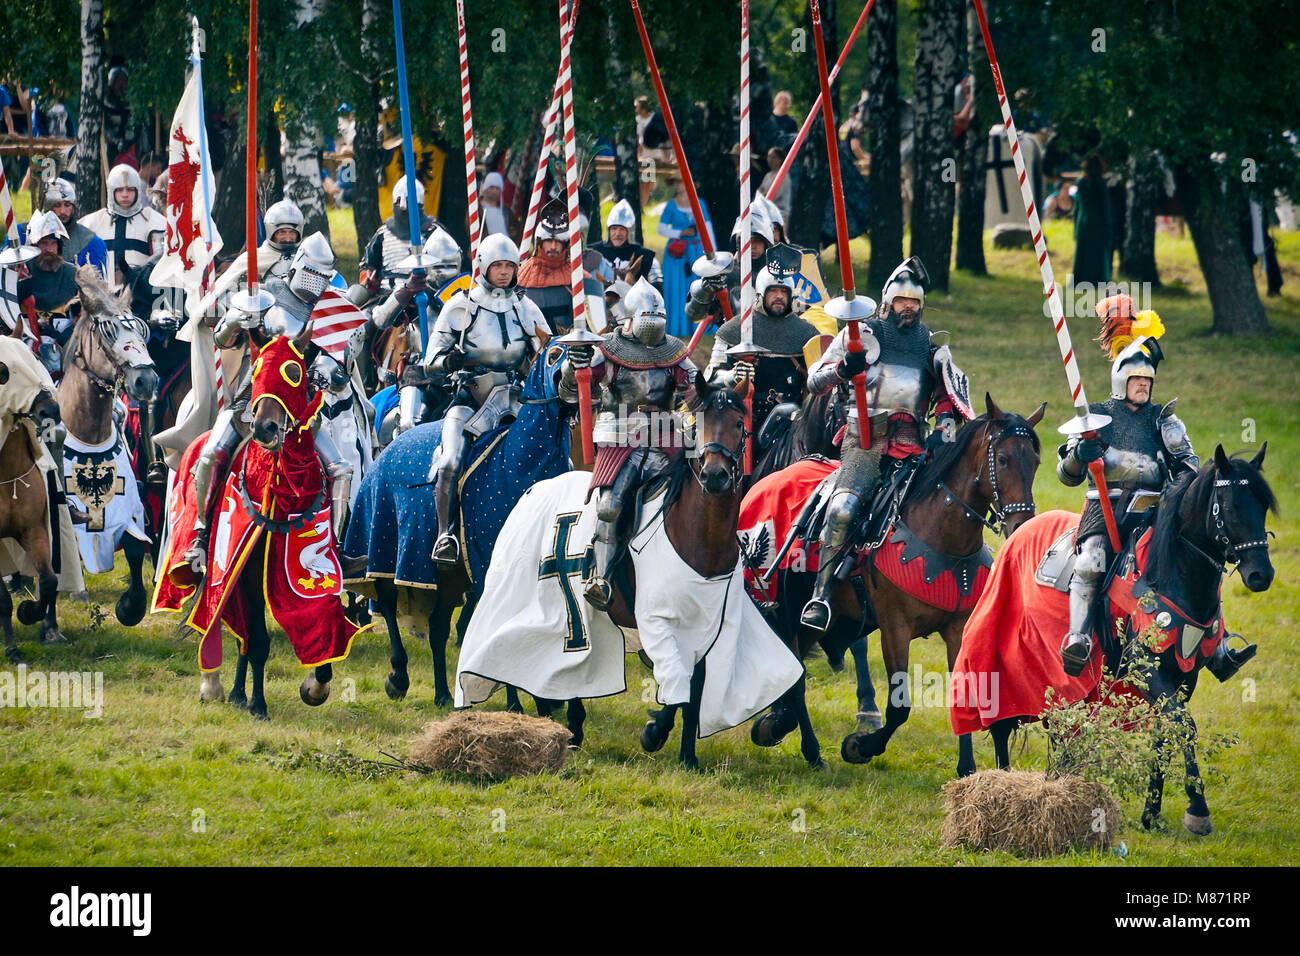 GRUNWALD - July 16: Teutonic horsemen - 601th anniversary of Battle of Grunwald 1410. 4000 reenactors, 1200 knights, Stock Photo